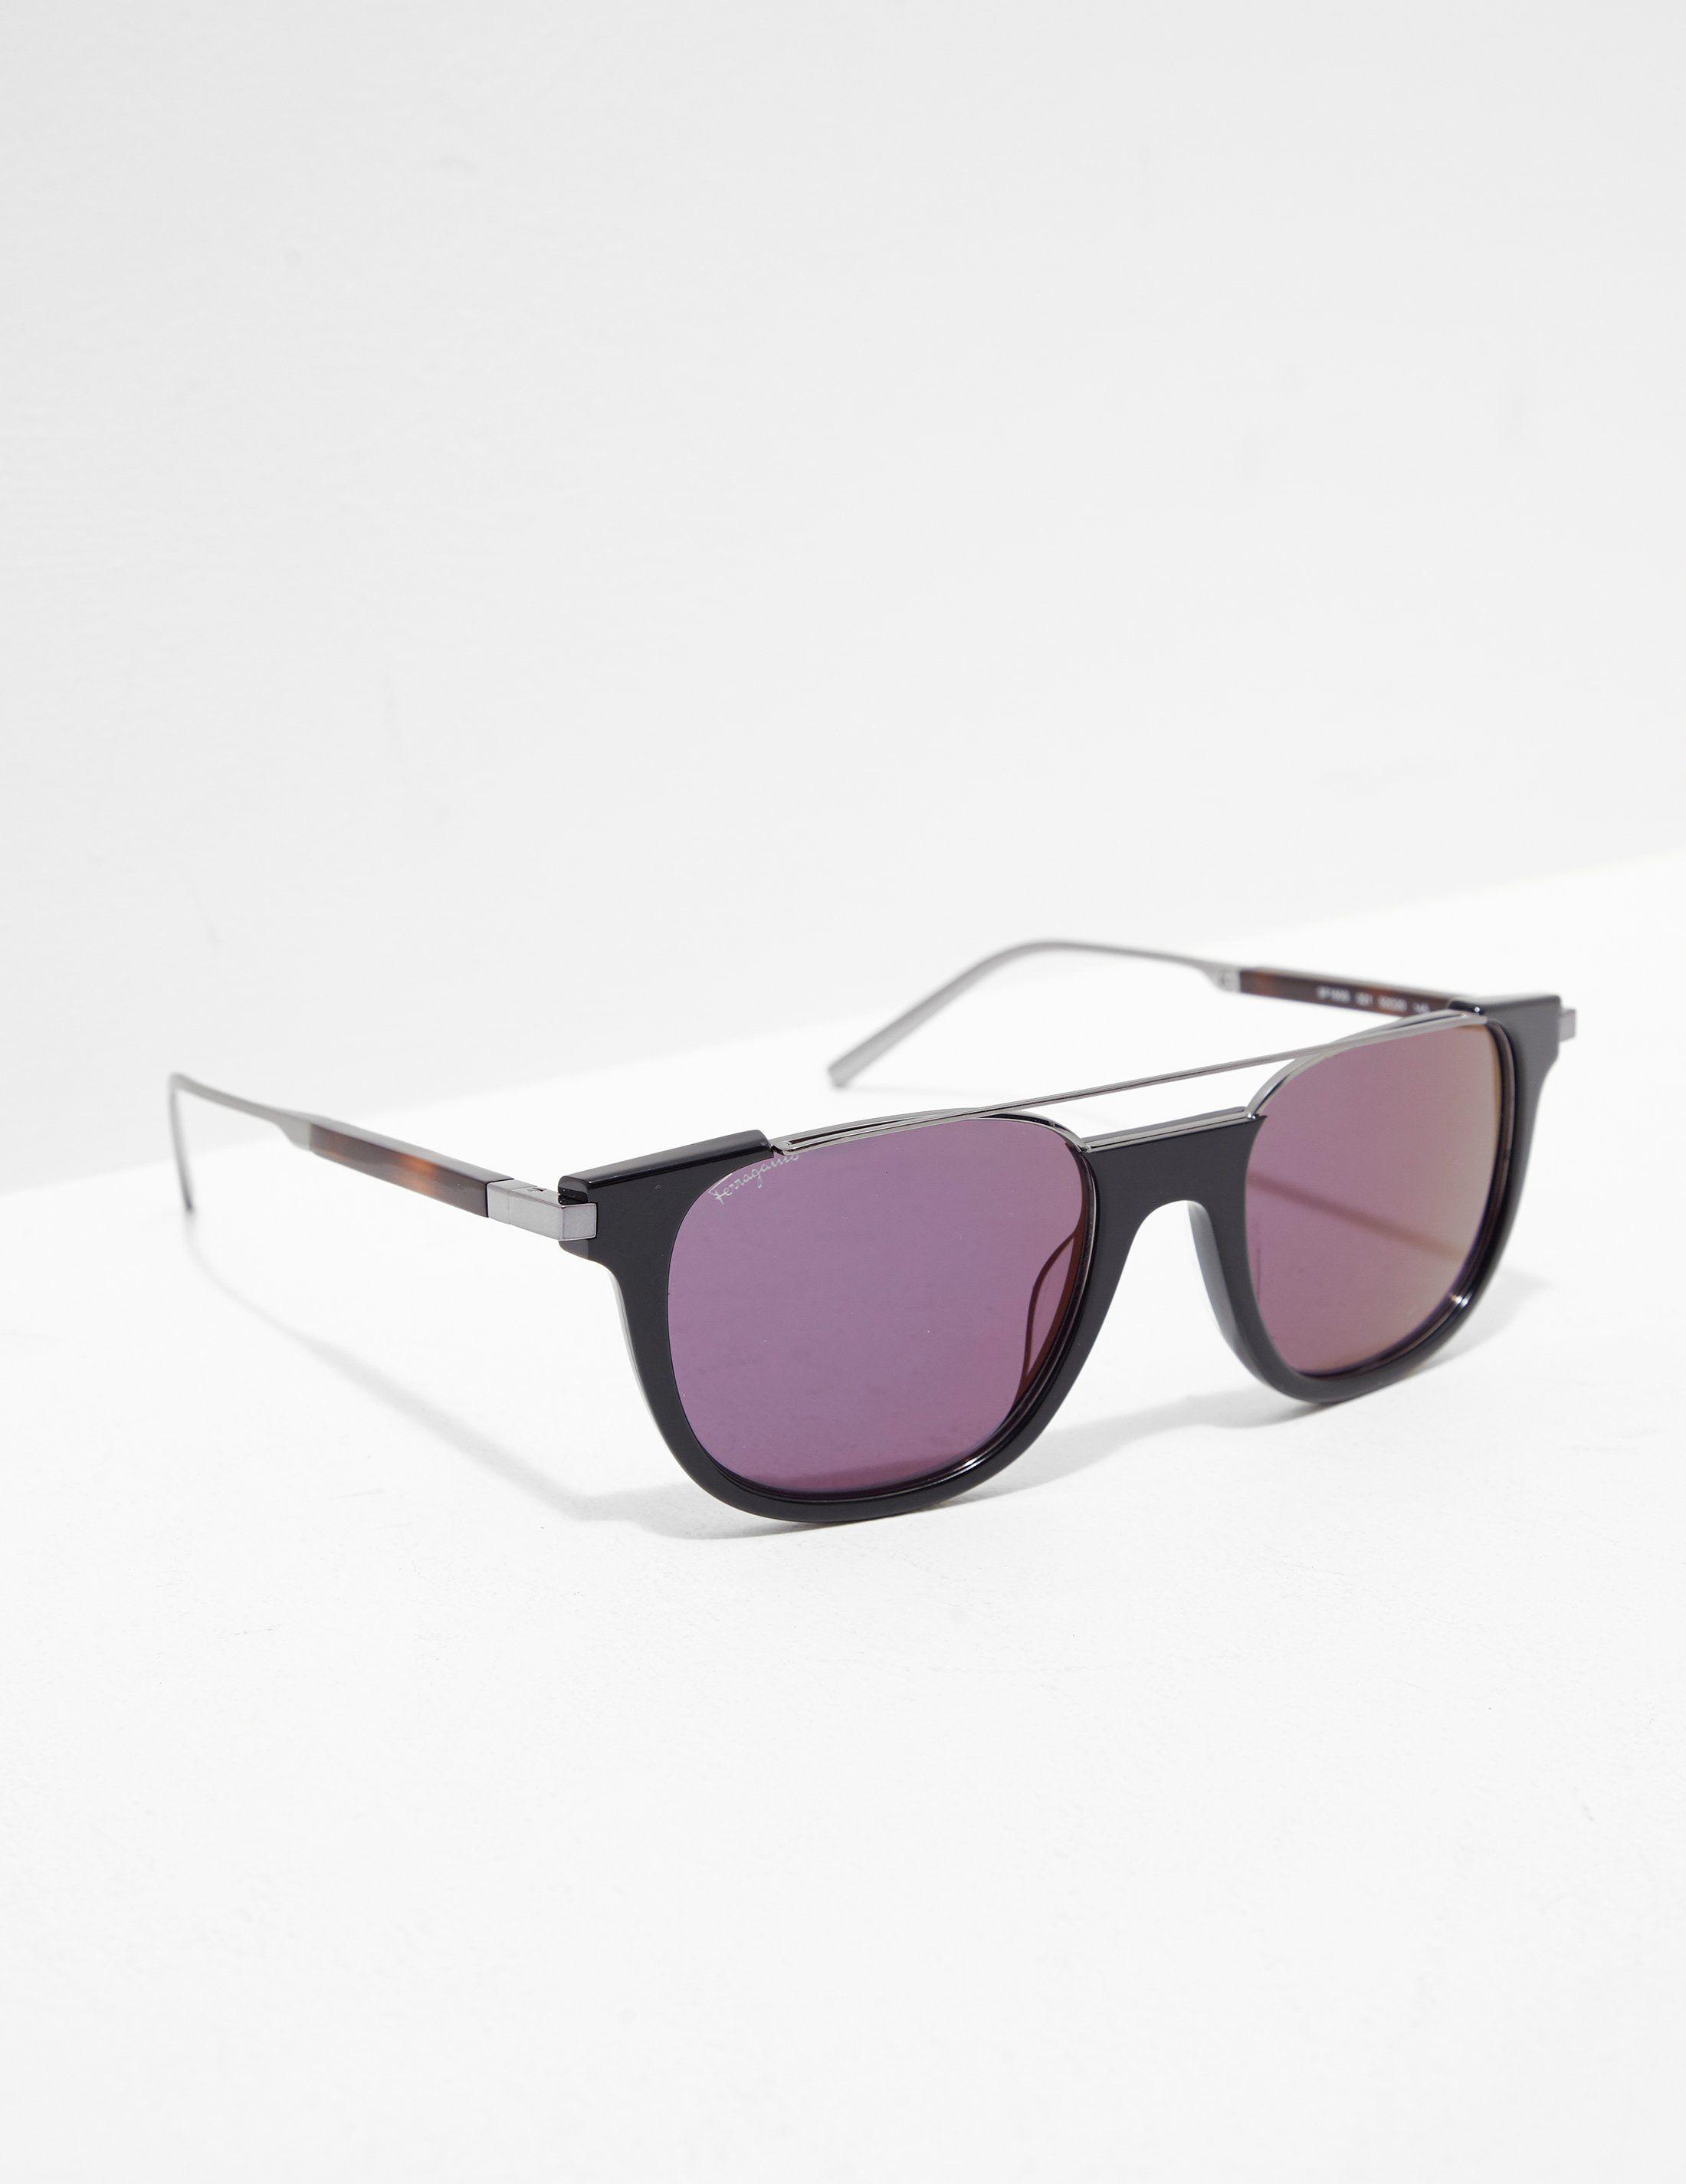 Salvatore Ferragamo Bar Sunglasses - Online Exclusive